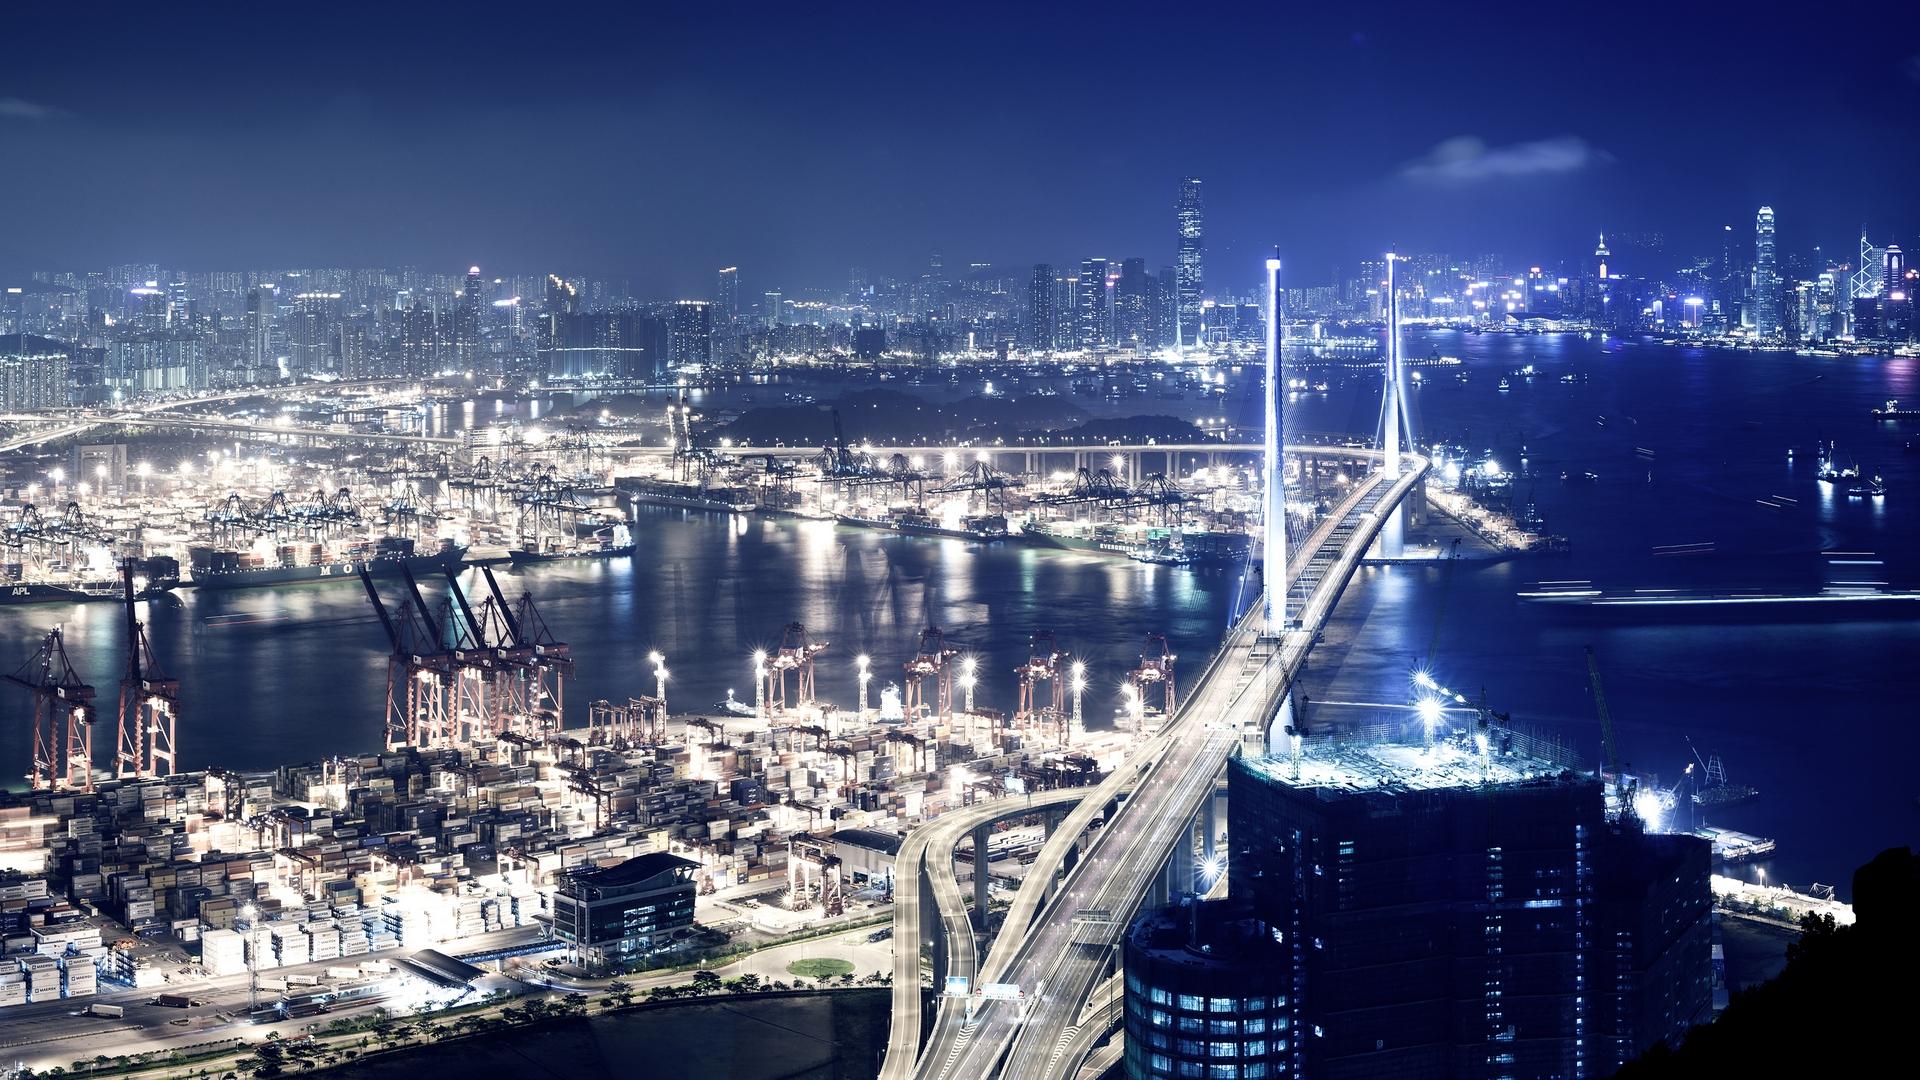 Download Hong Kong City Night View Wallpaper Wallpapers 1920x1080